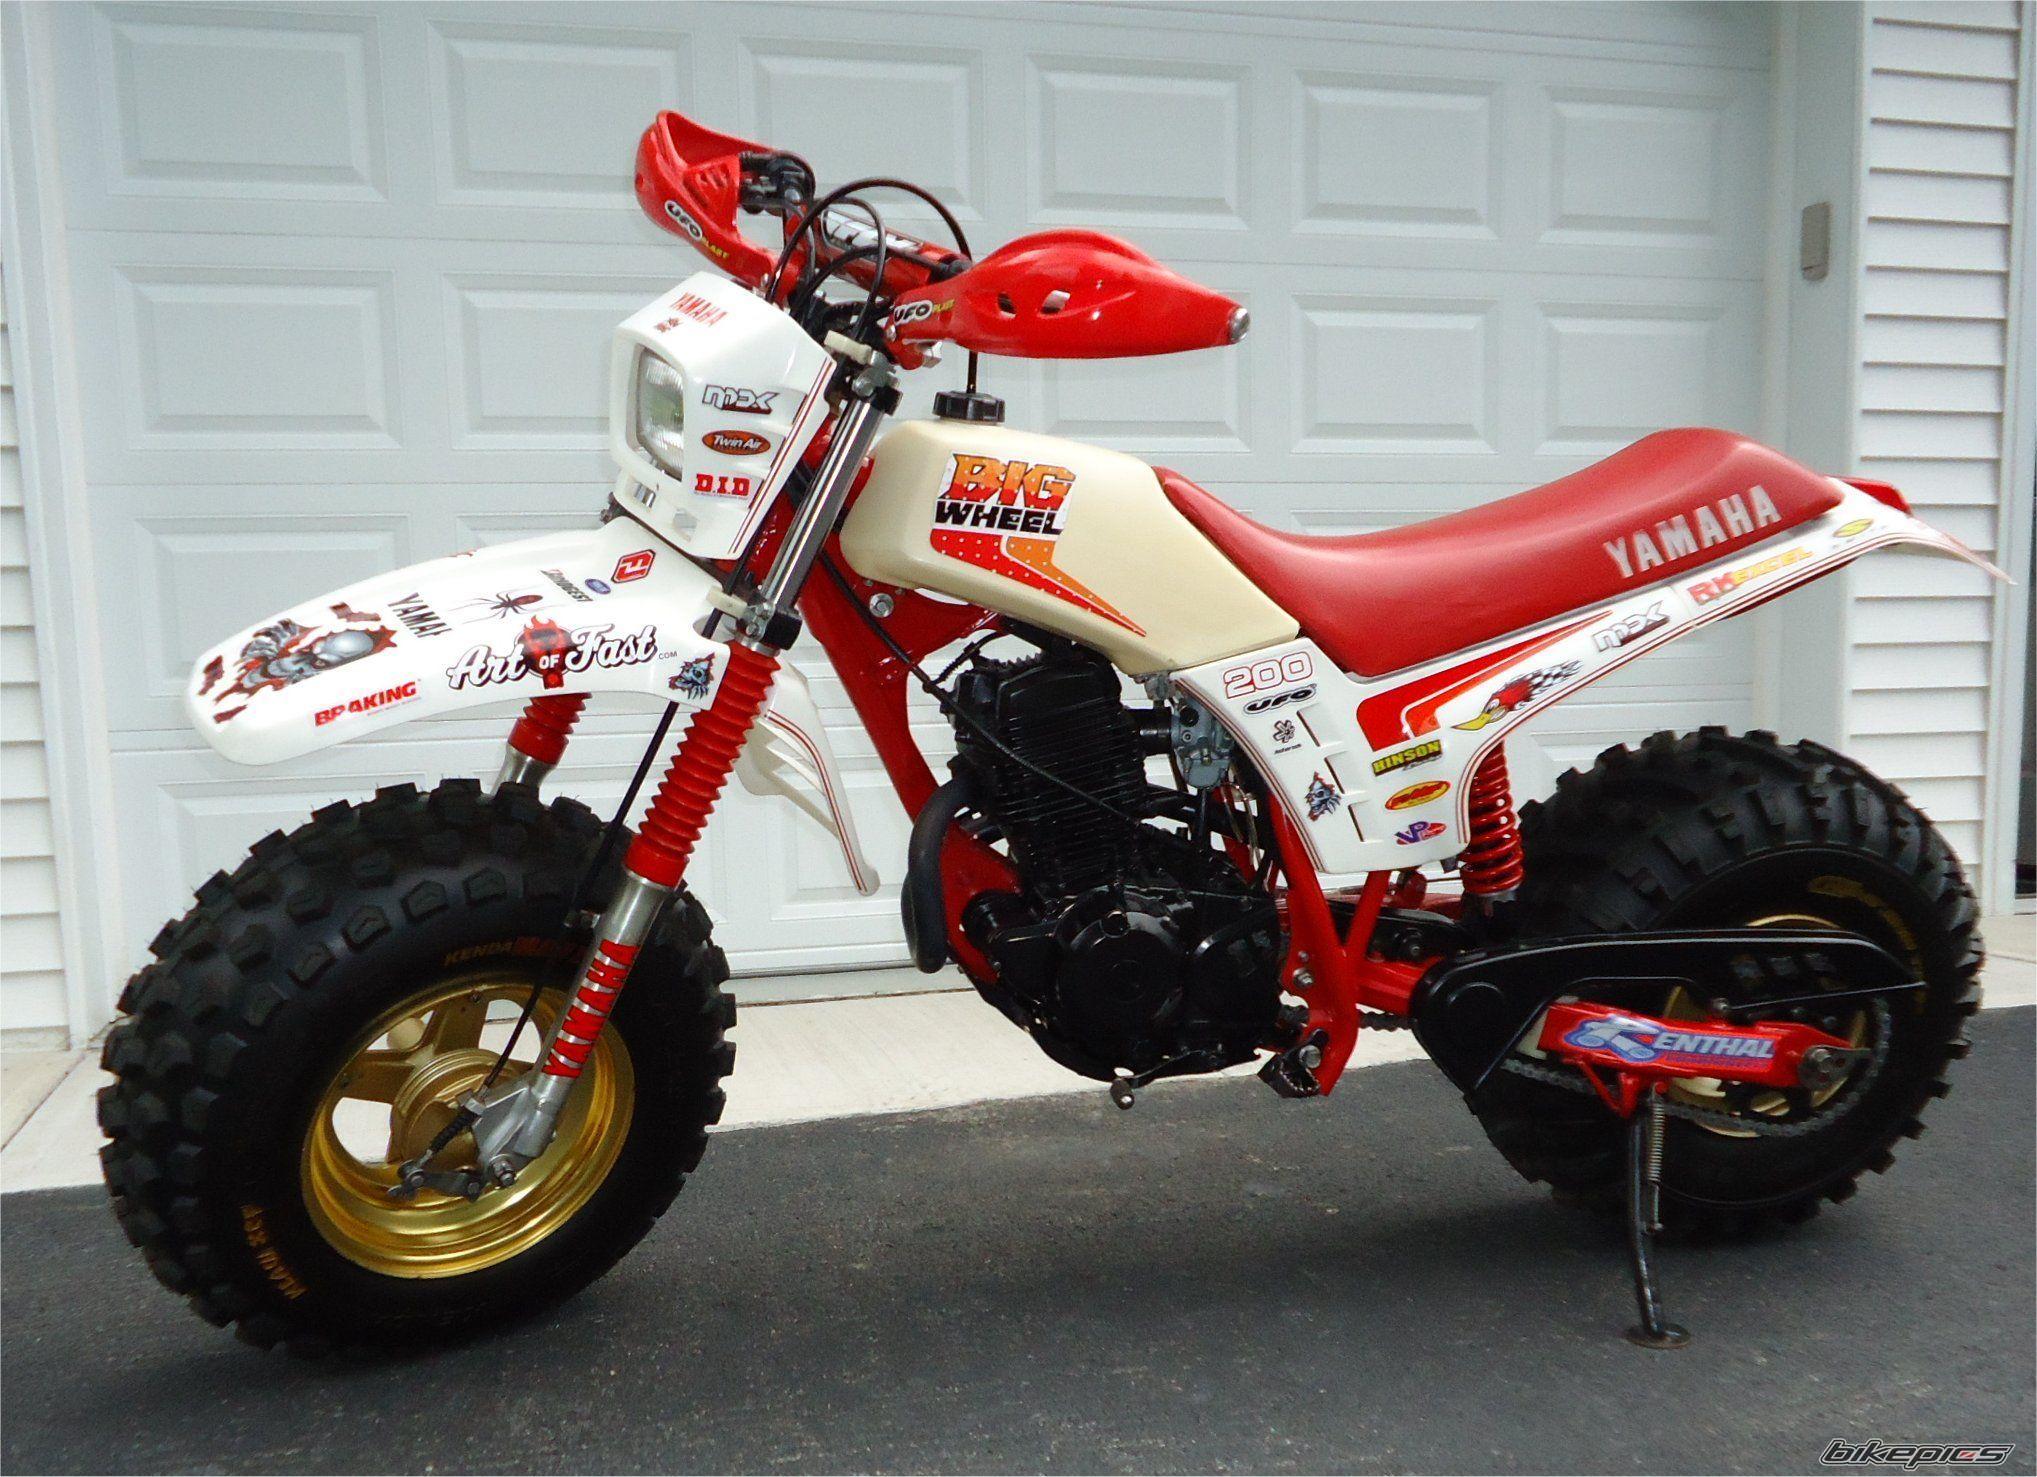 1986 Yamaha BW 200 | Projects to Try | Yamaha, Honda, Motorcycle